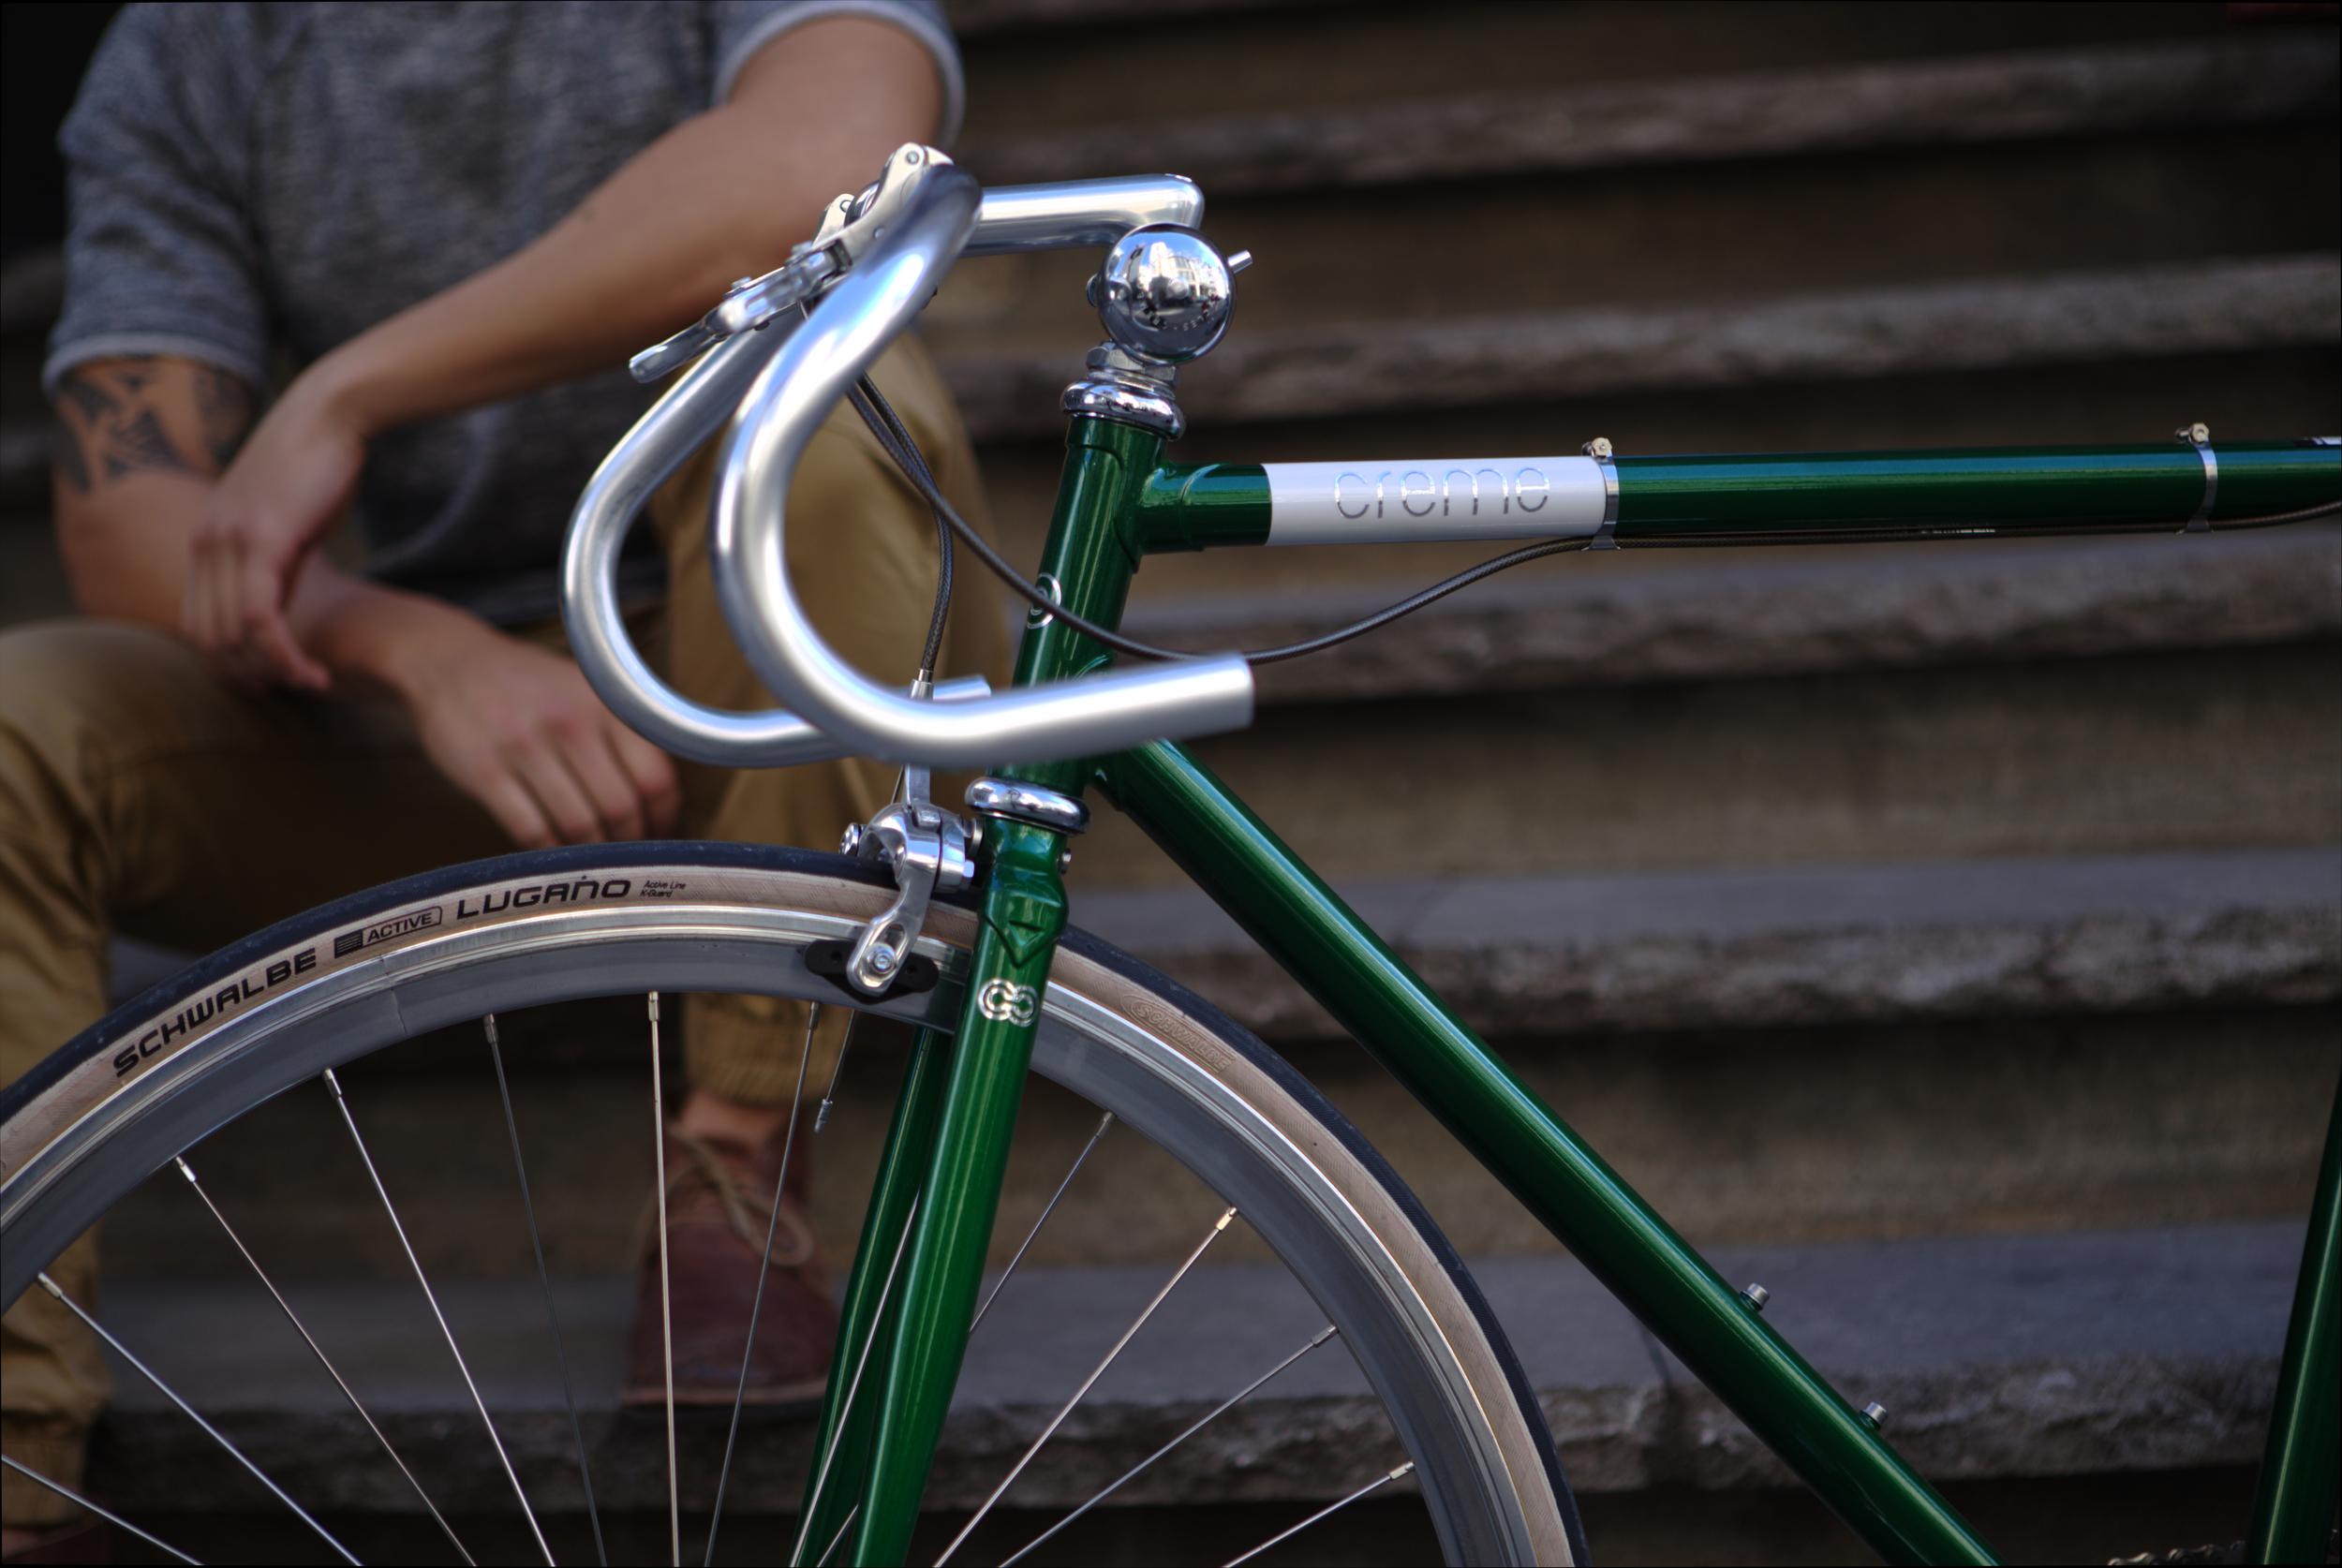 Creme Cycles Fixed Gear Bike Toronto Canada.jpg